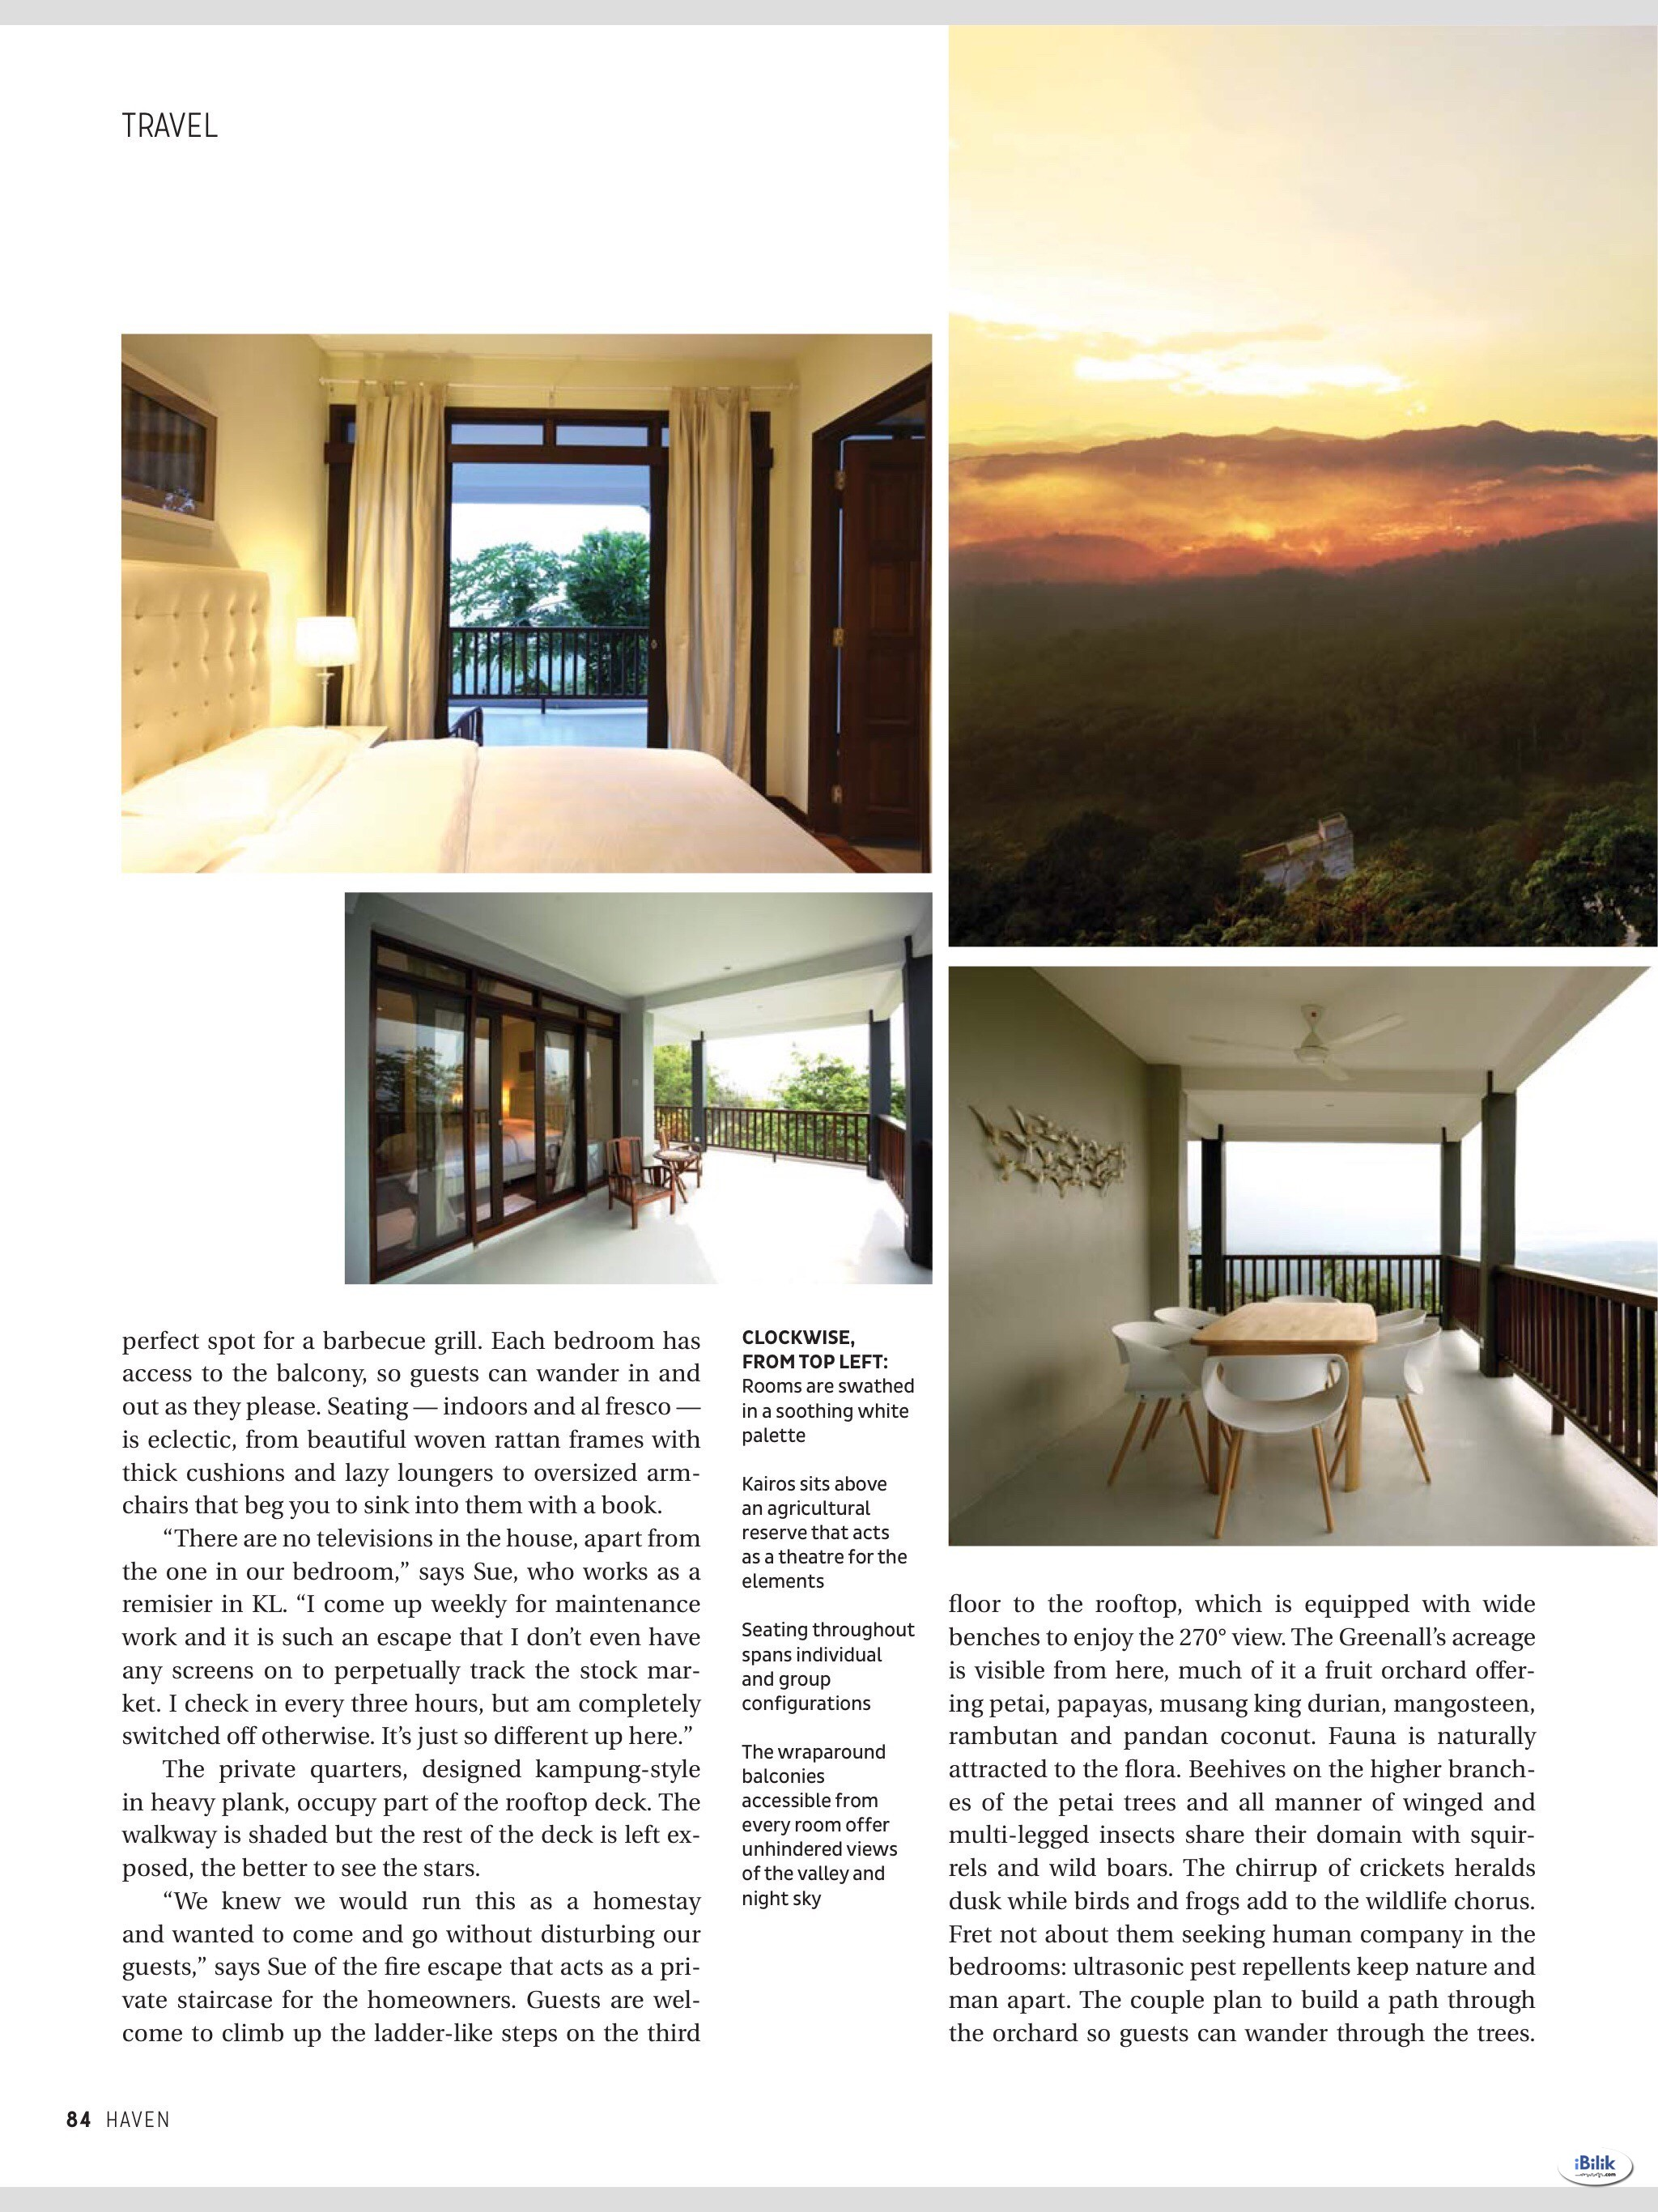 Abundance: Queen room with attached bath @ Kairos Villa, Jalan Pantai, Seremban